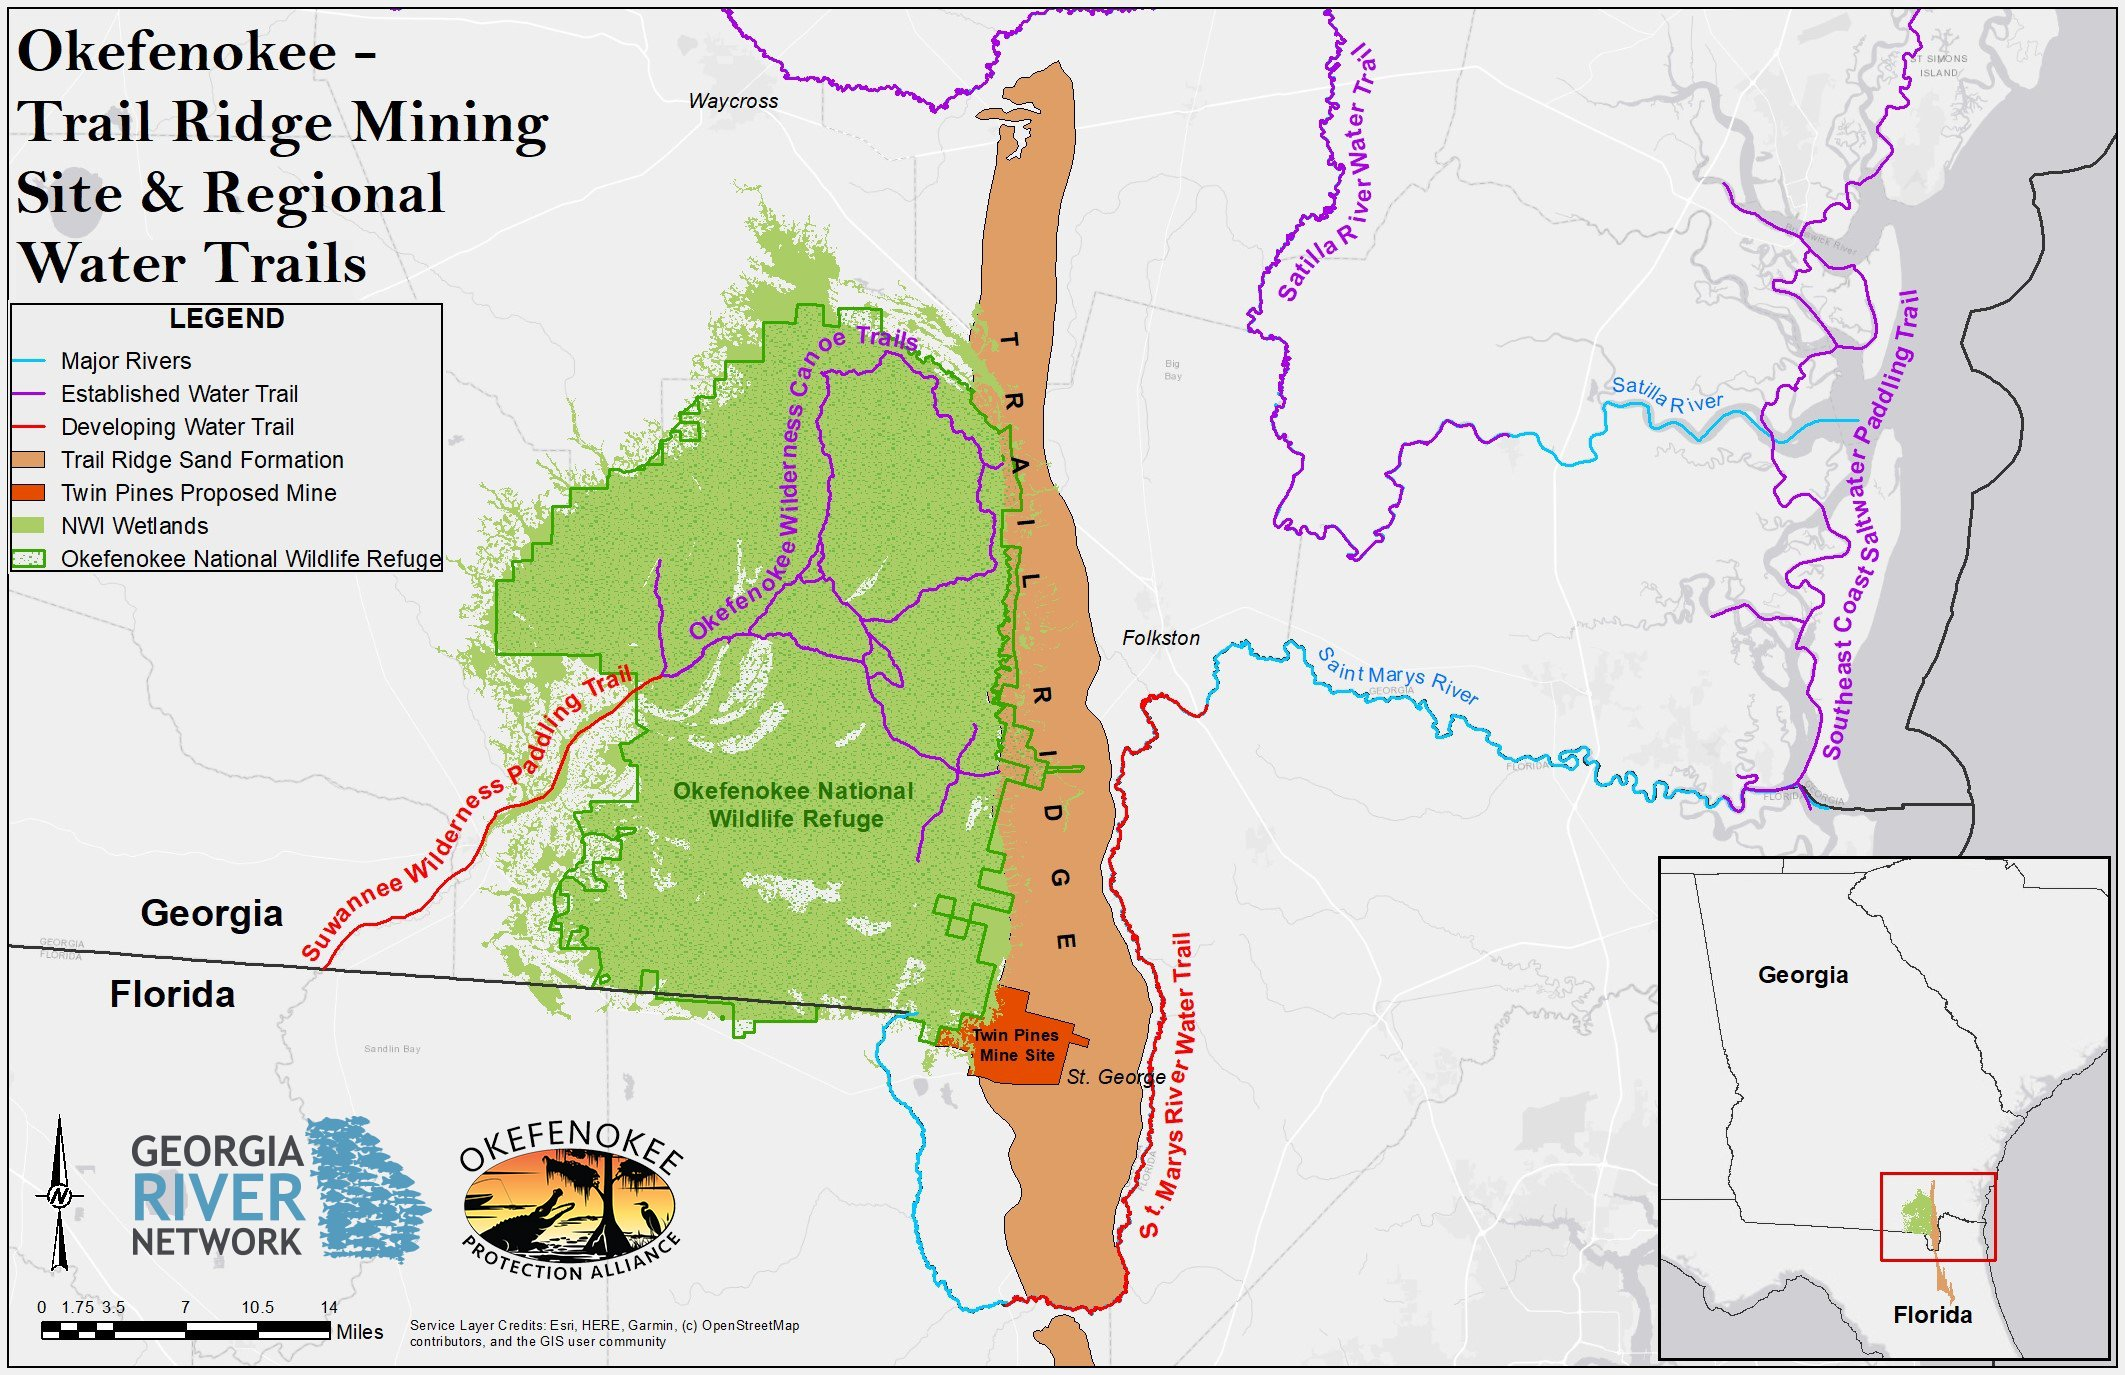 Okefenokee Trail Ridge Mining Site & Regional Water Trails